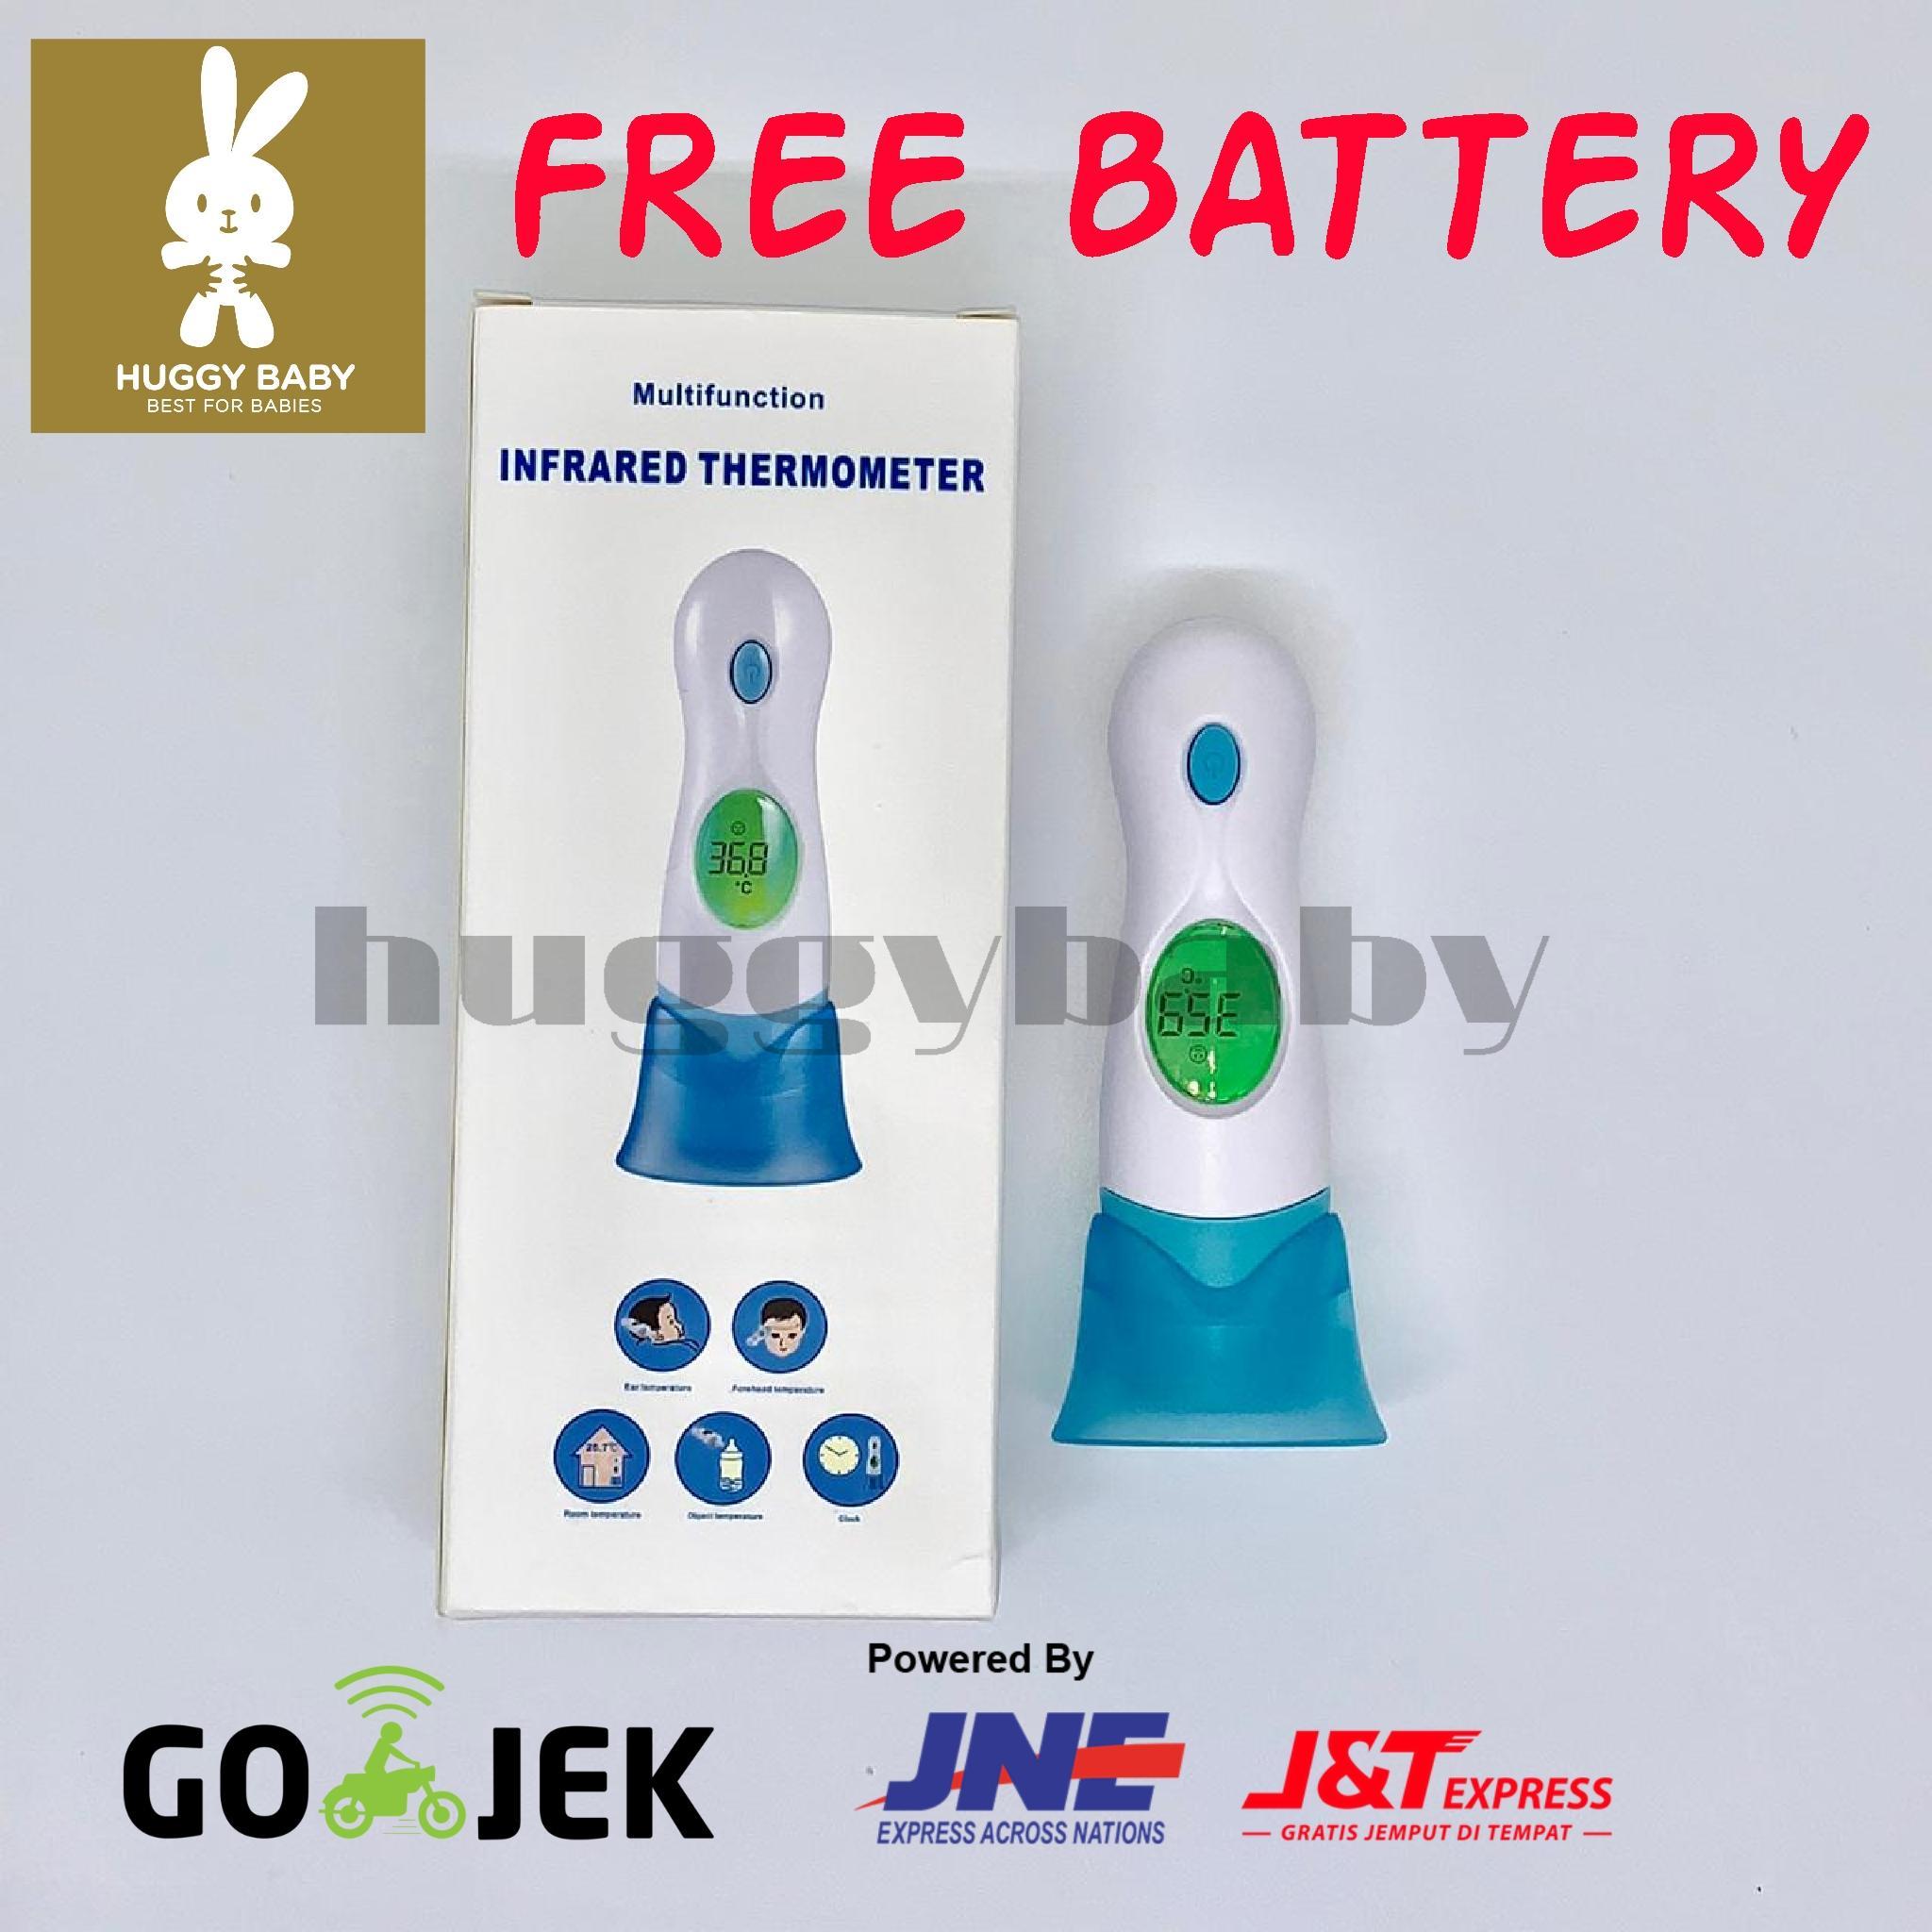 Termometer Infrared Thermometer Alat Pengukur Suhu Bayi Dan Dewasa By Huggy Baby.